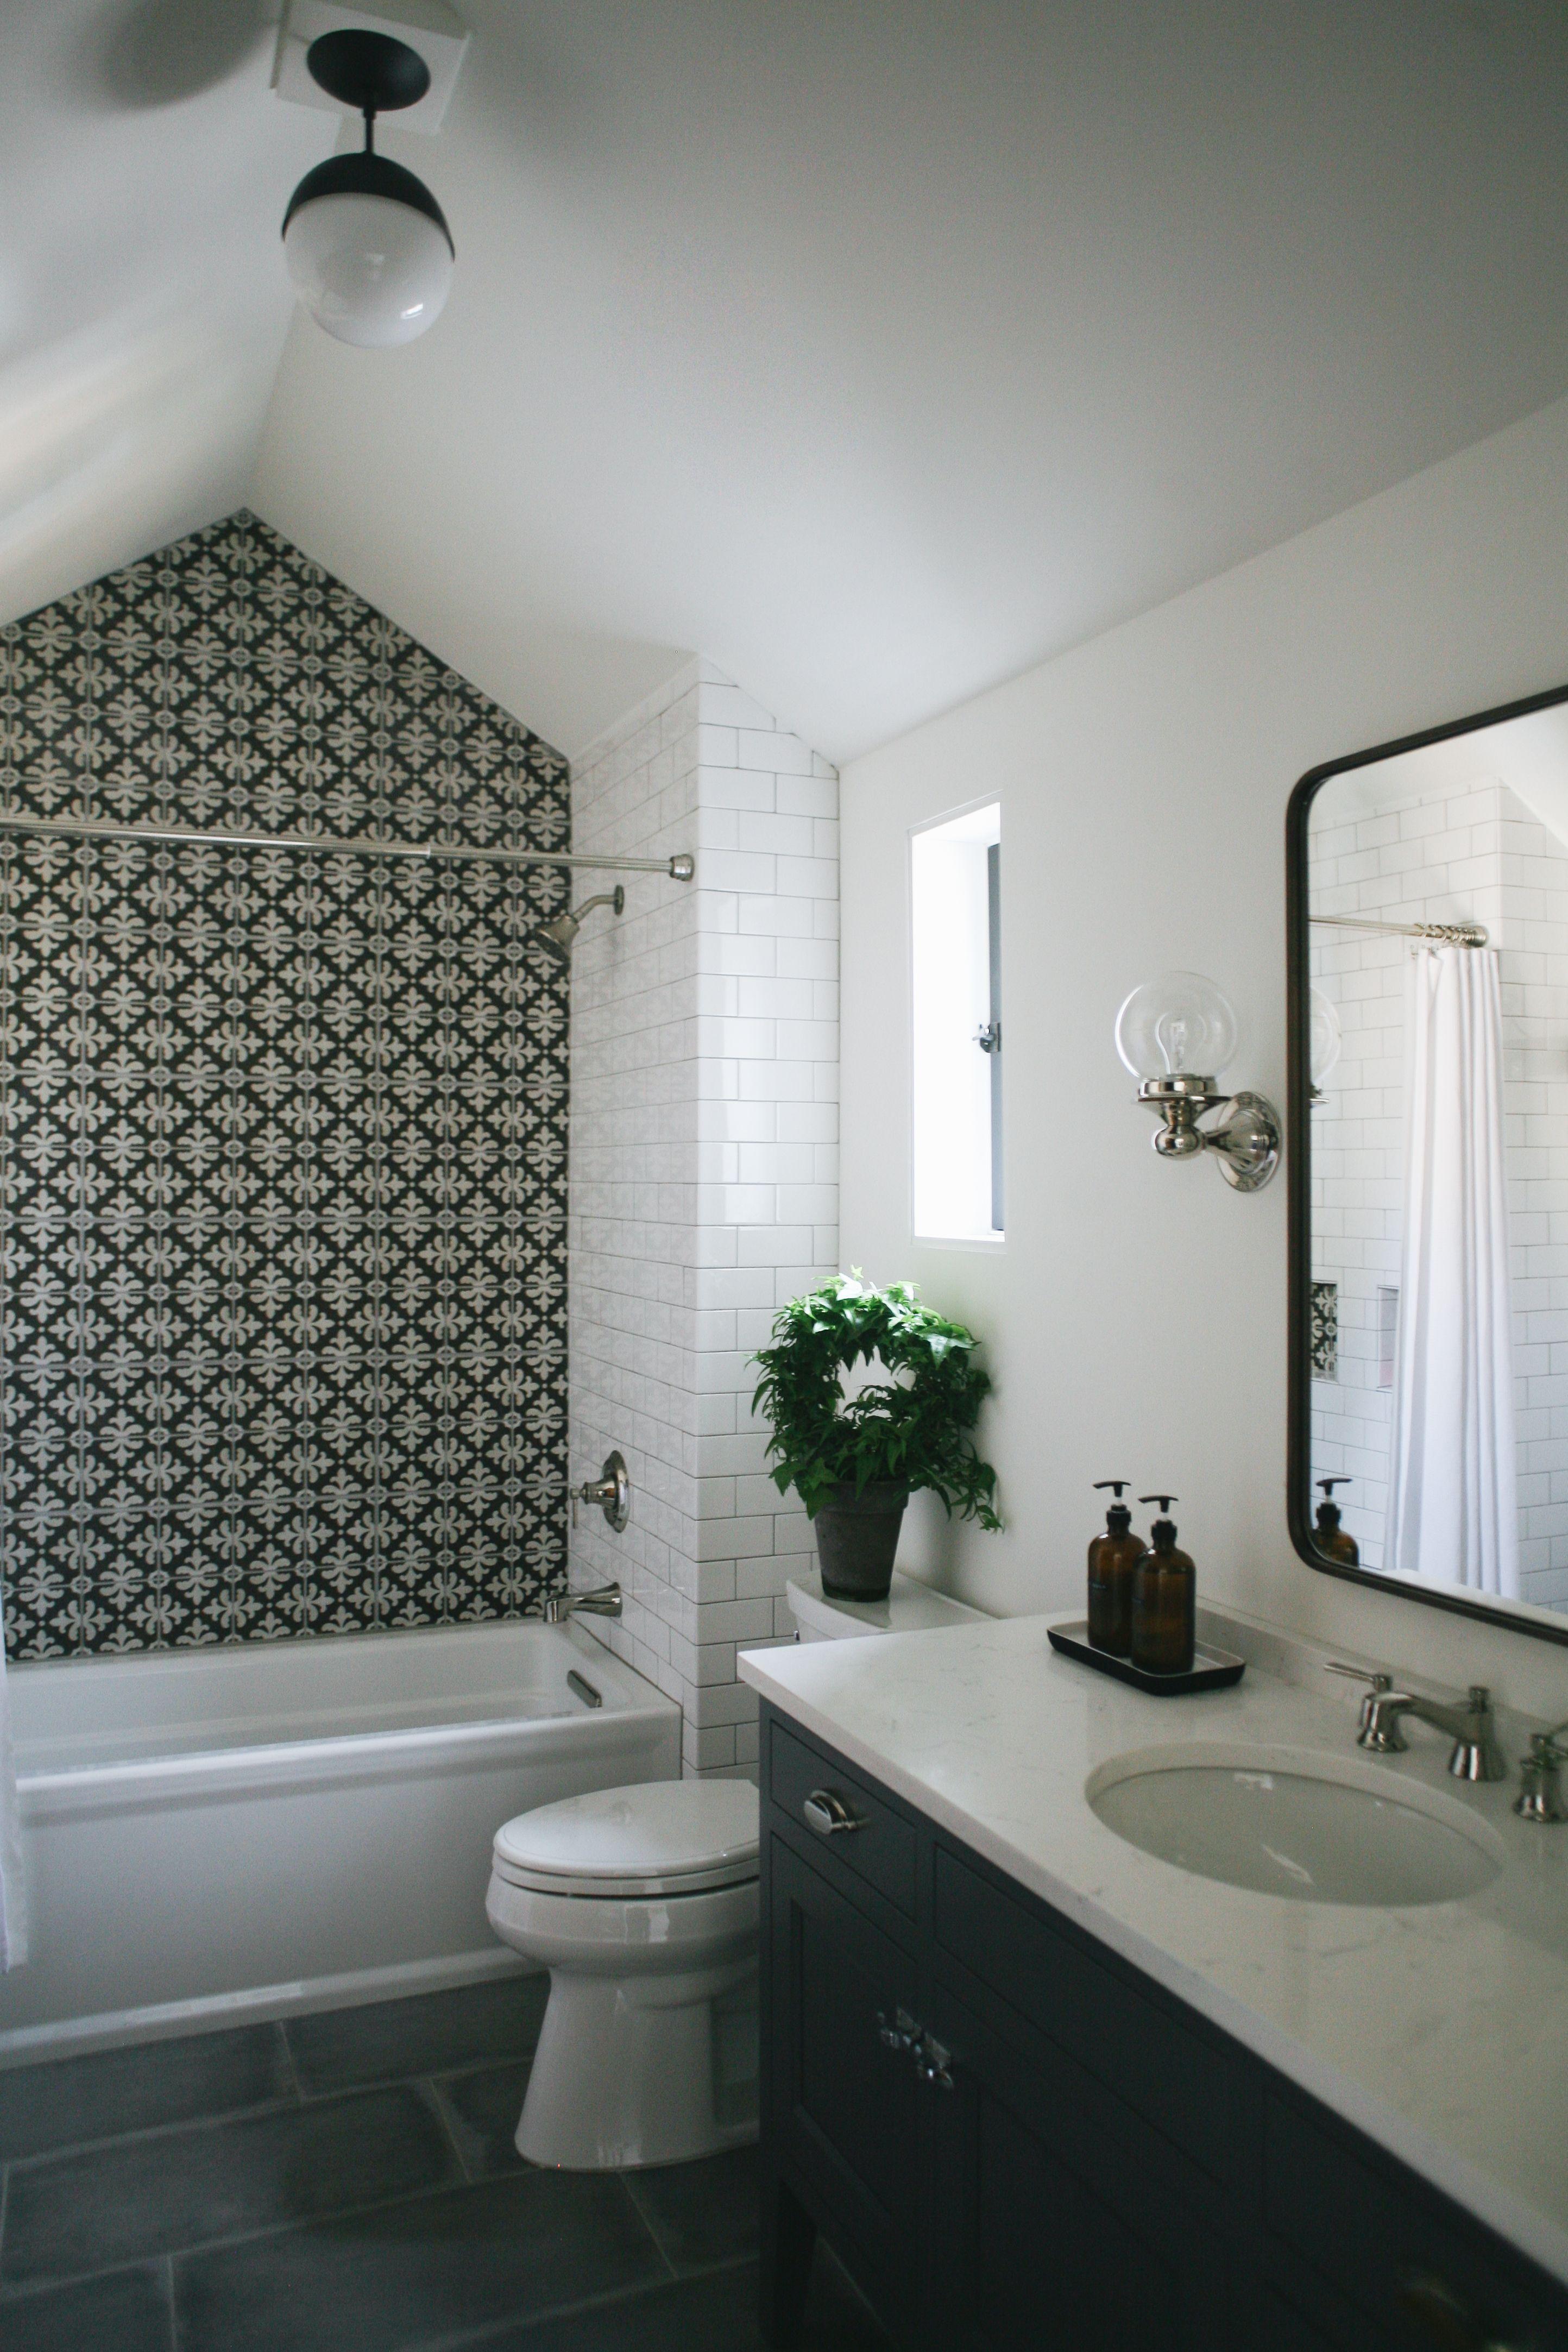 54 Beautiful Bathroom Design Ideas For Inspiration Bathroom